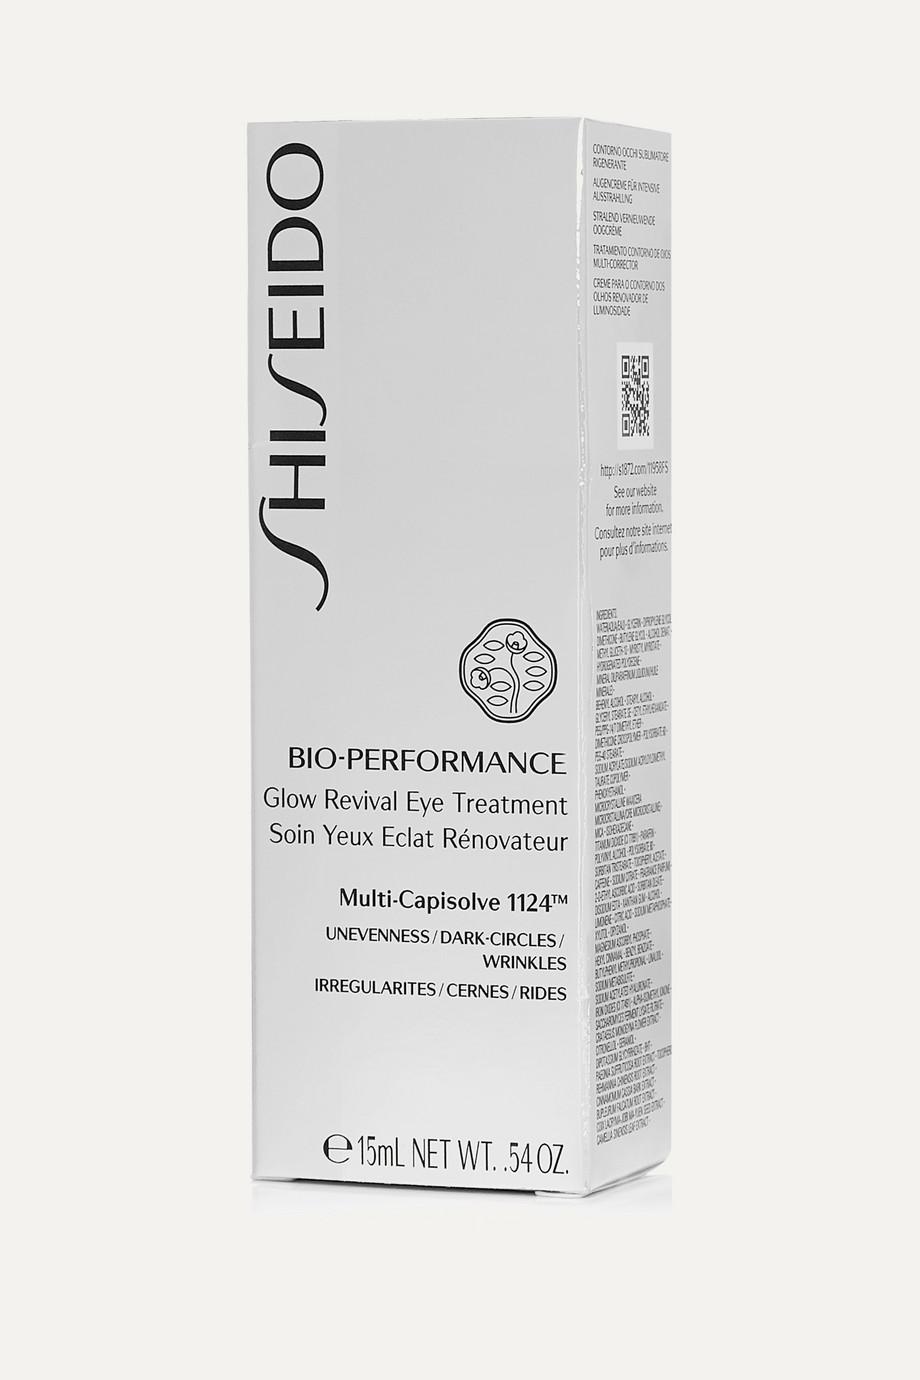 Shiseido Bio-Performance Glow Revival Eye Treatment, 15 ml – Augenserum